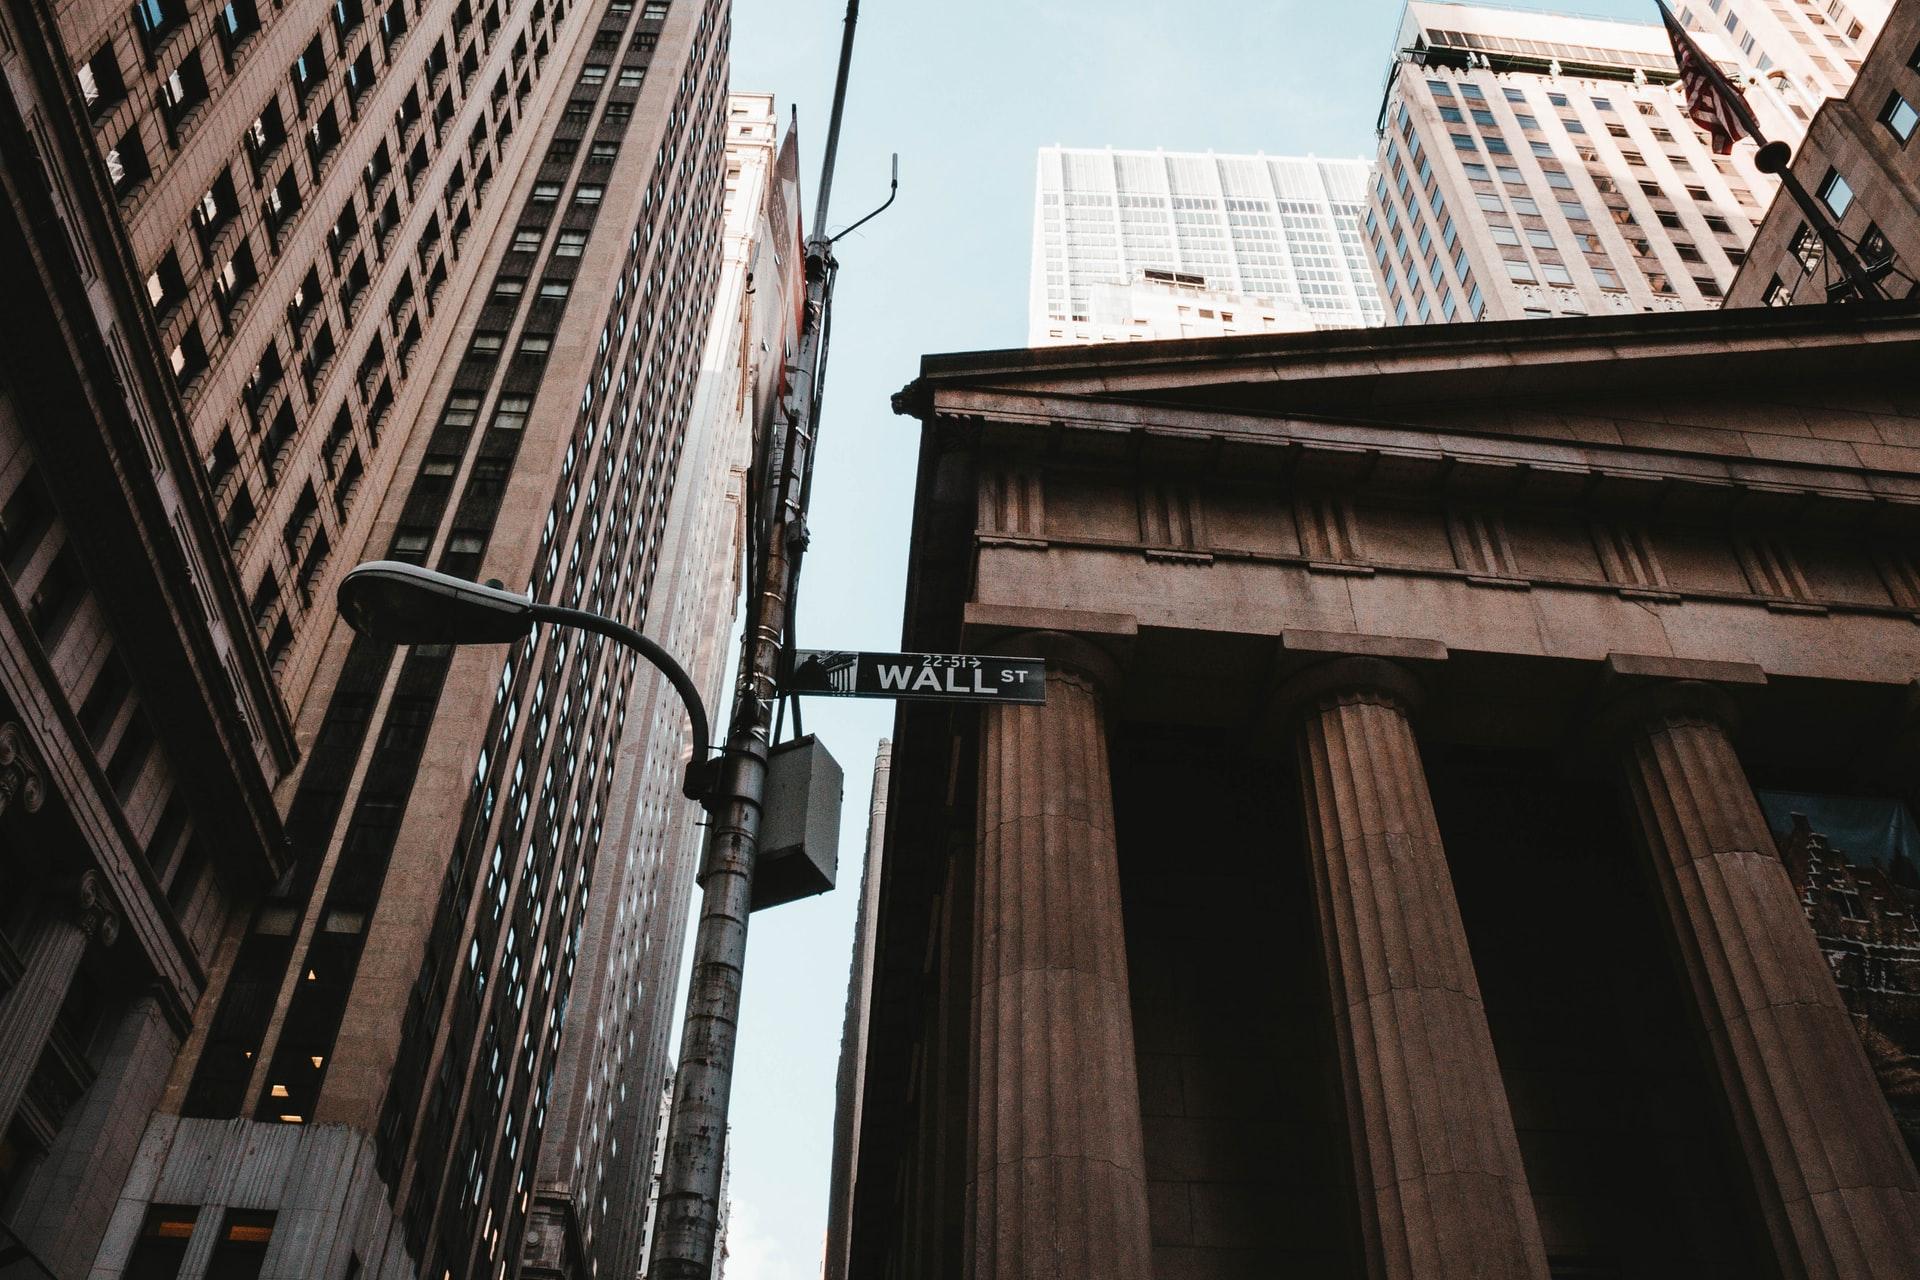 Des bâtiments de la rue Wall Street